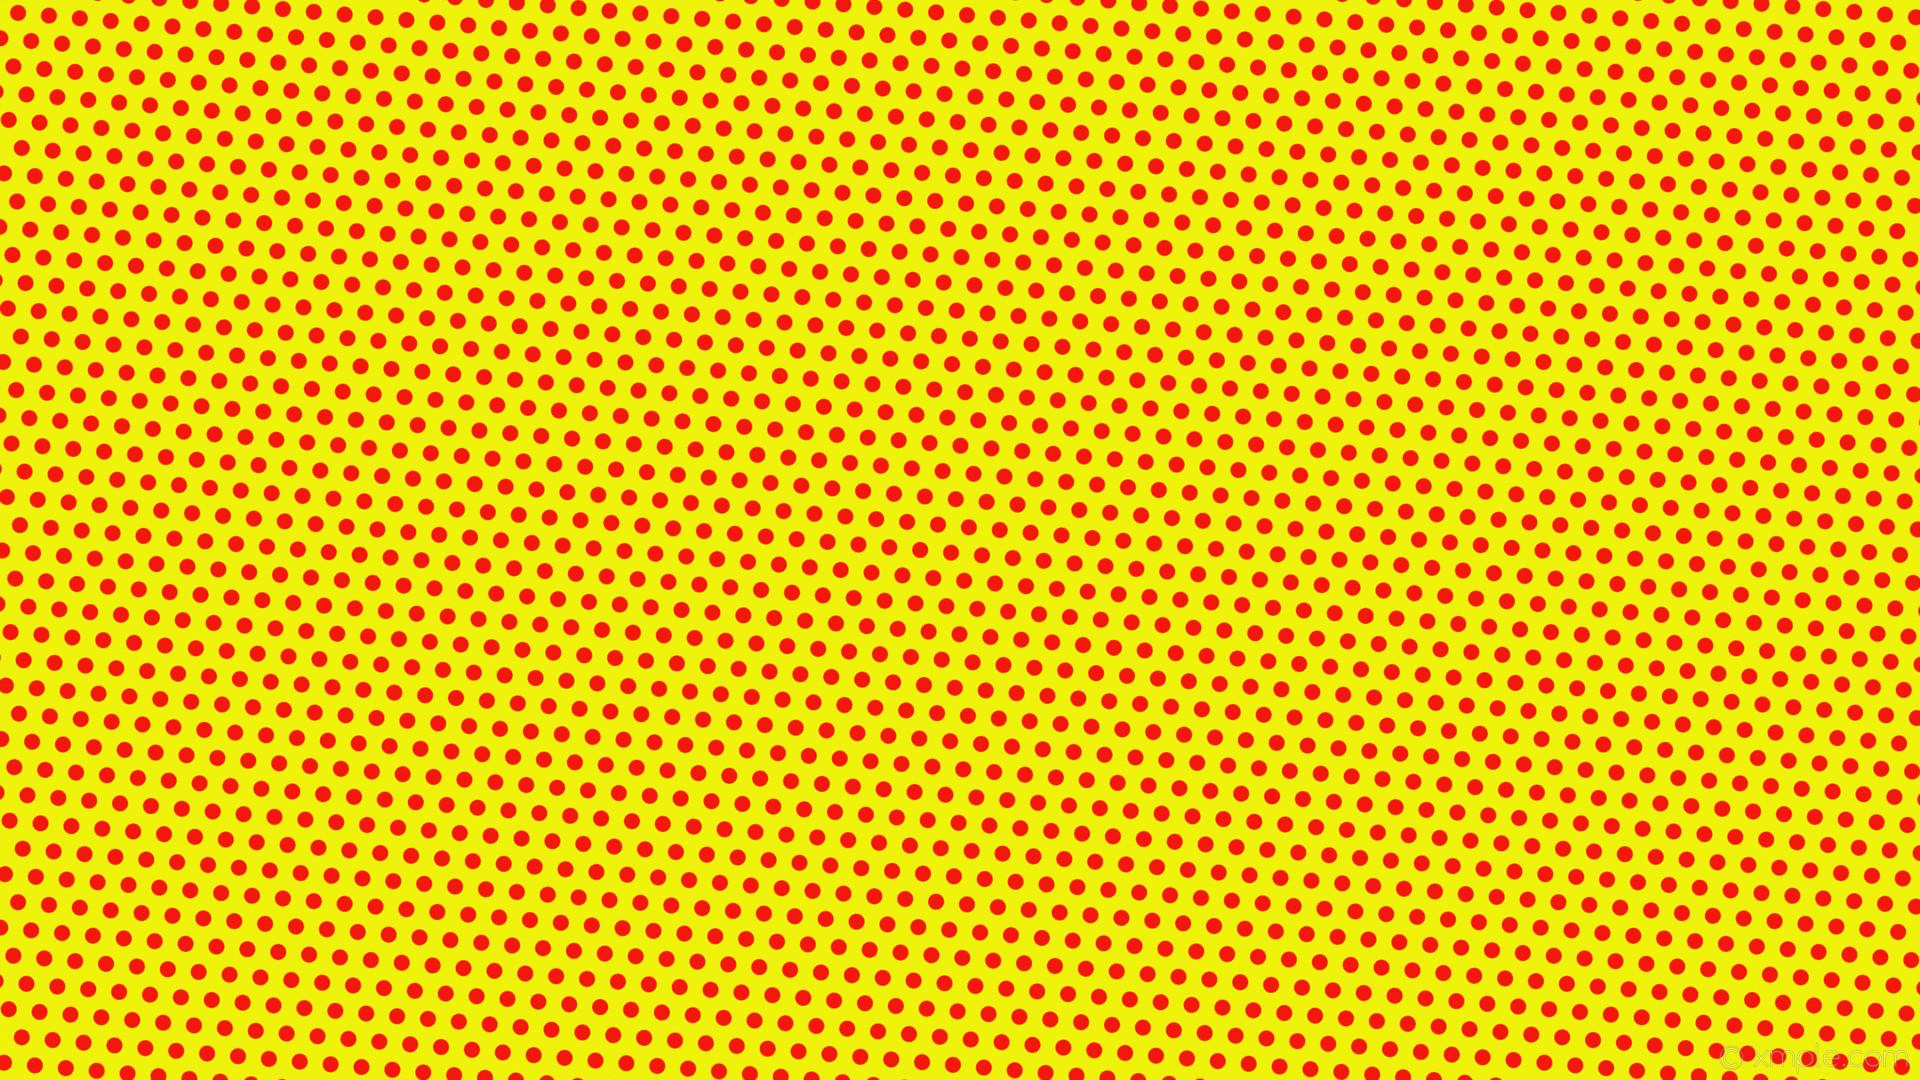 wallpaper red polka hexagon yellow dots #eff30b #f3180b diagonal 55° 16px  31px